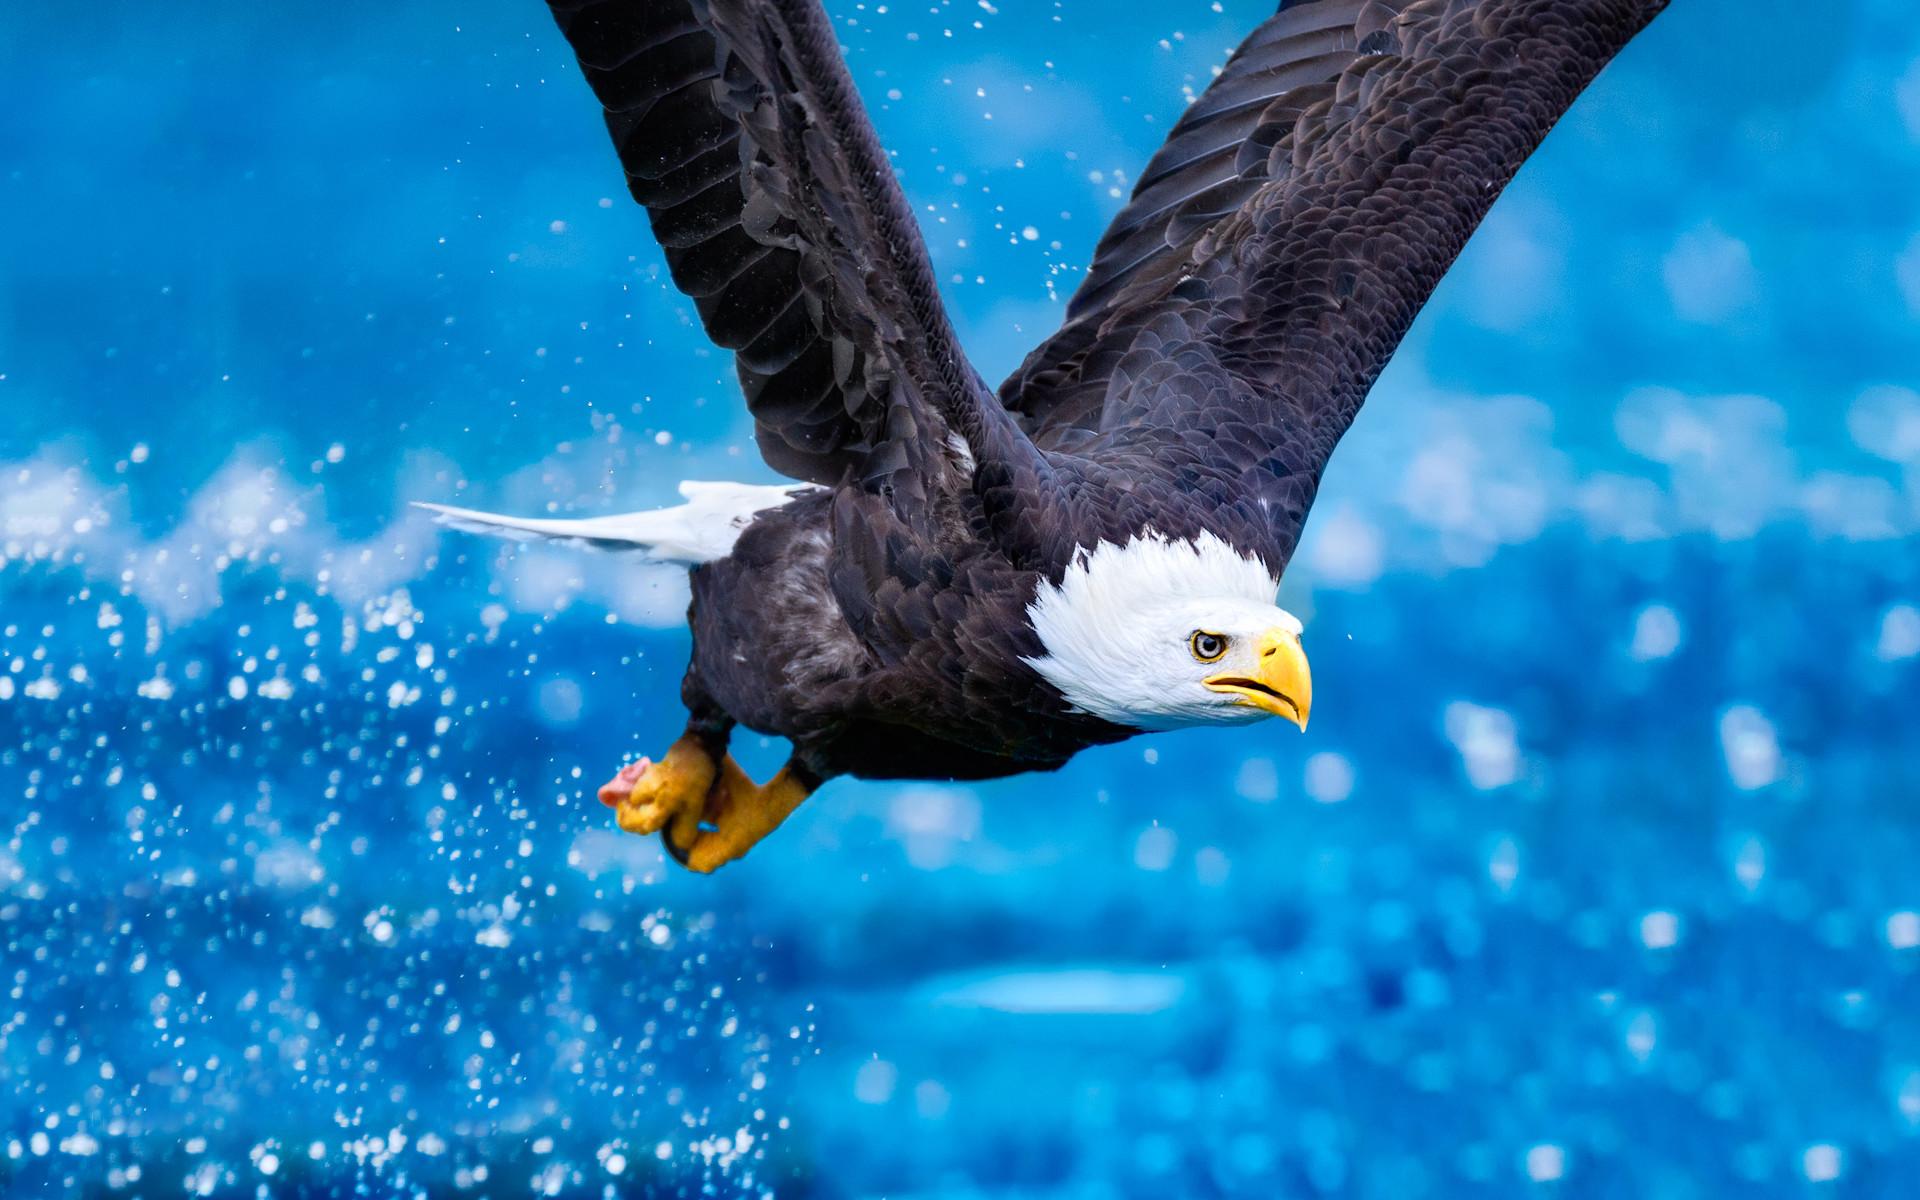 bald eagle wallpapers. Â«Â«